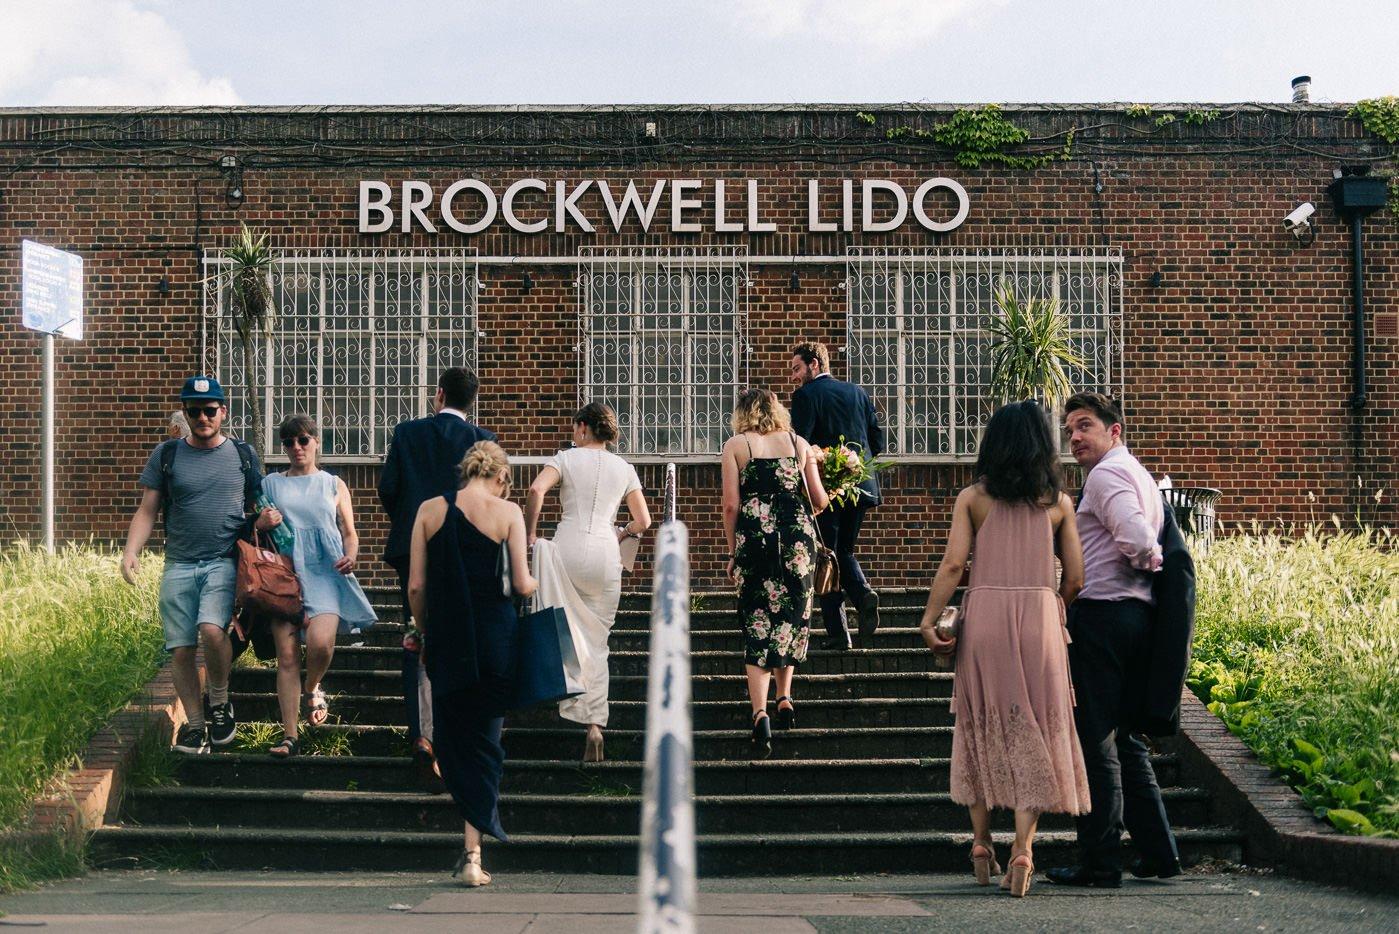 Art deco wedding venue London Reportage brockwell lido